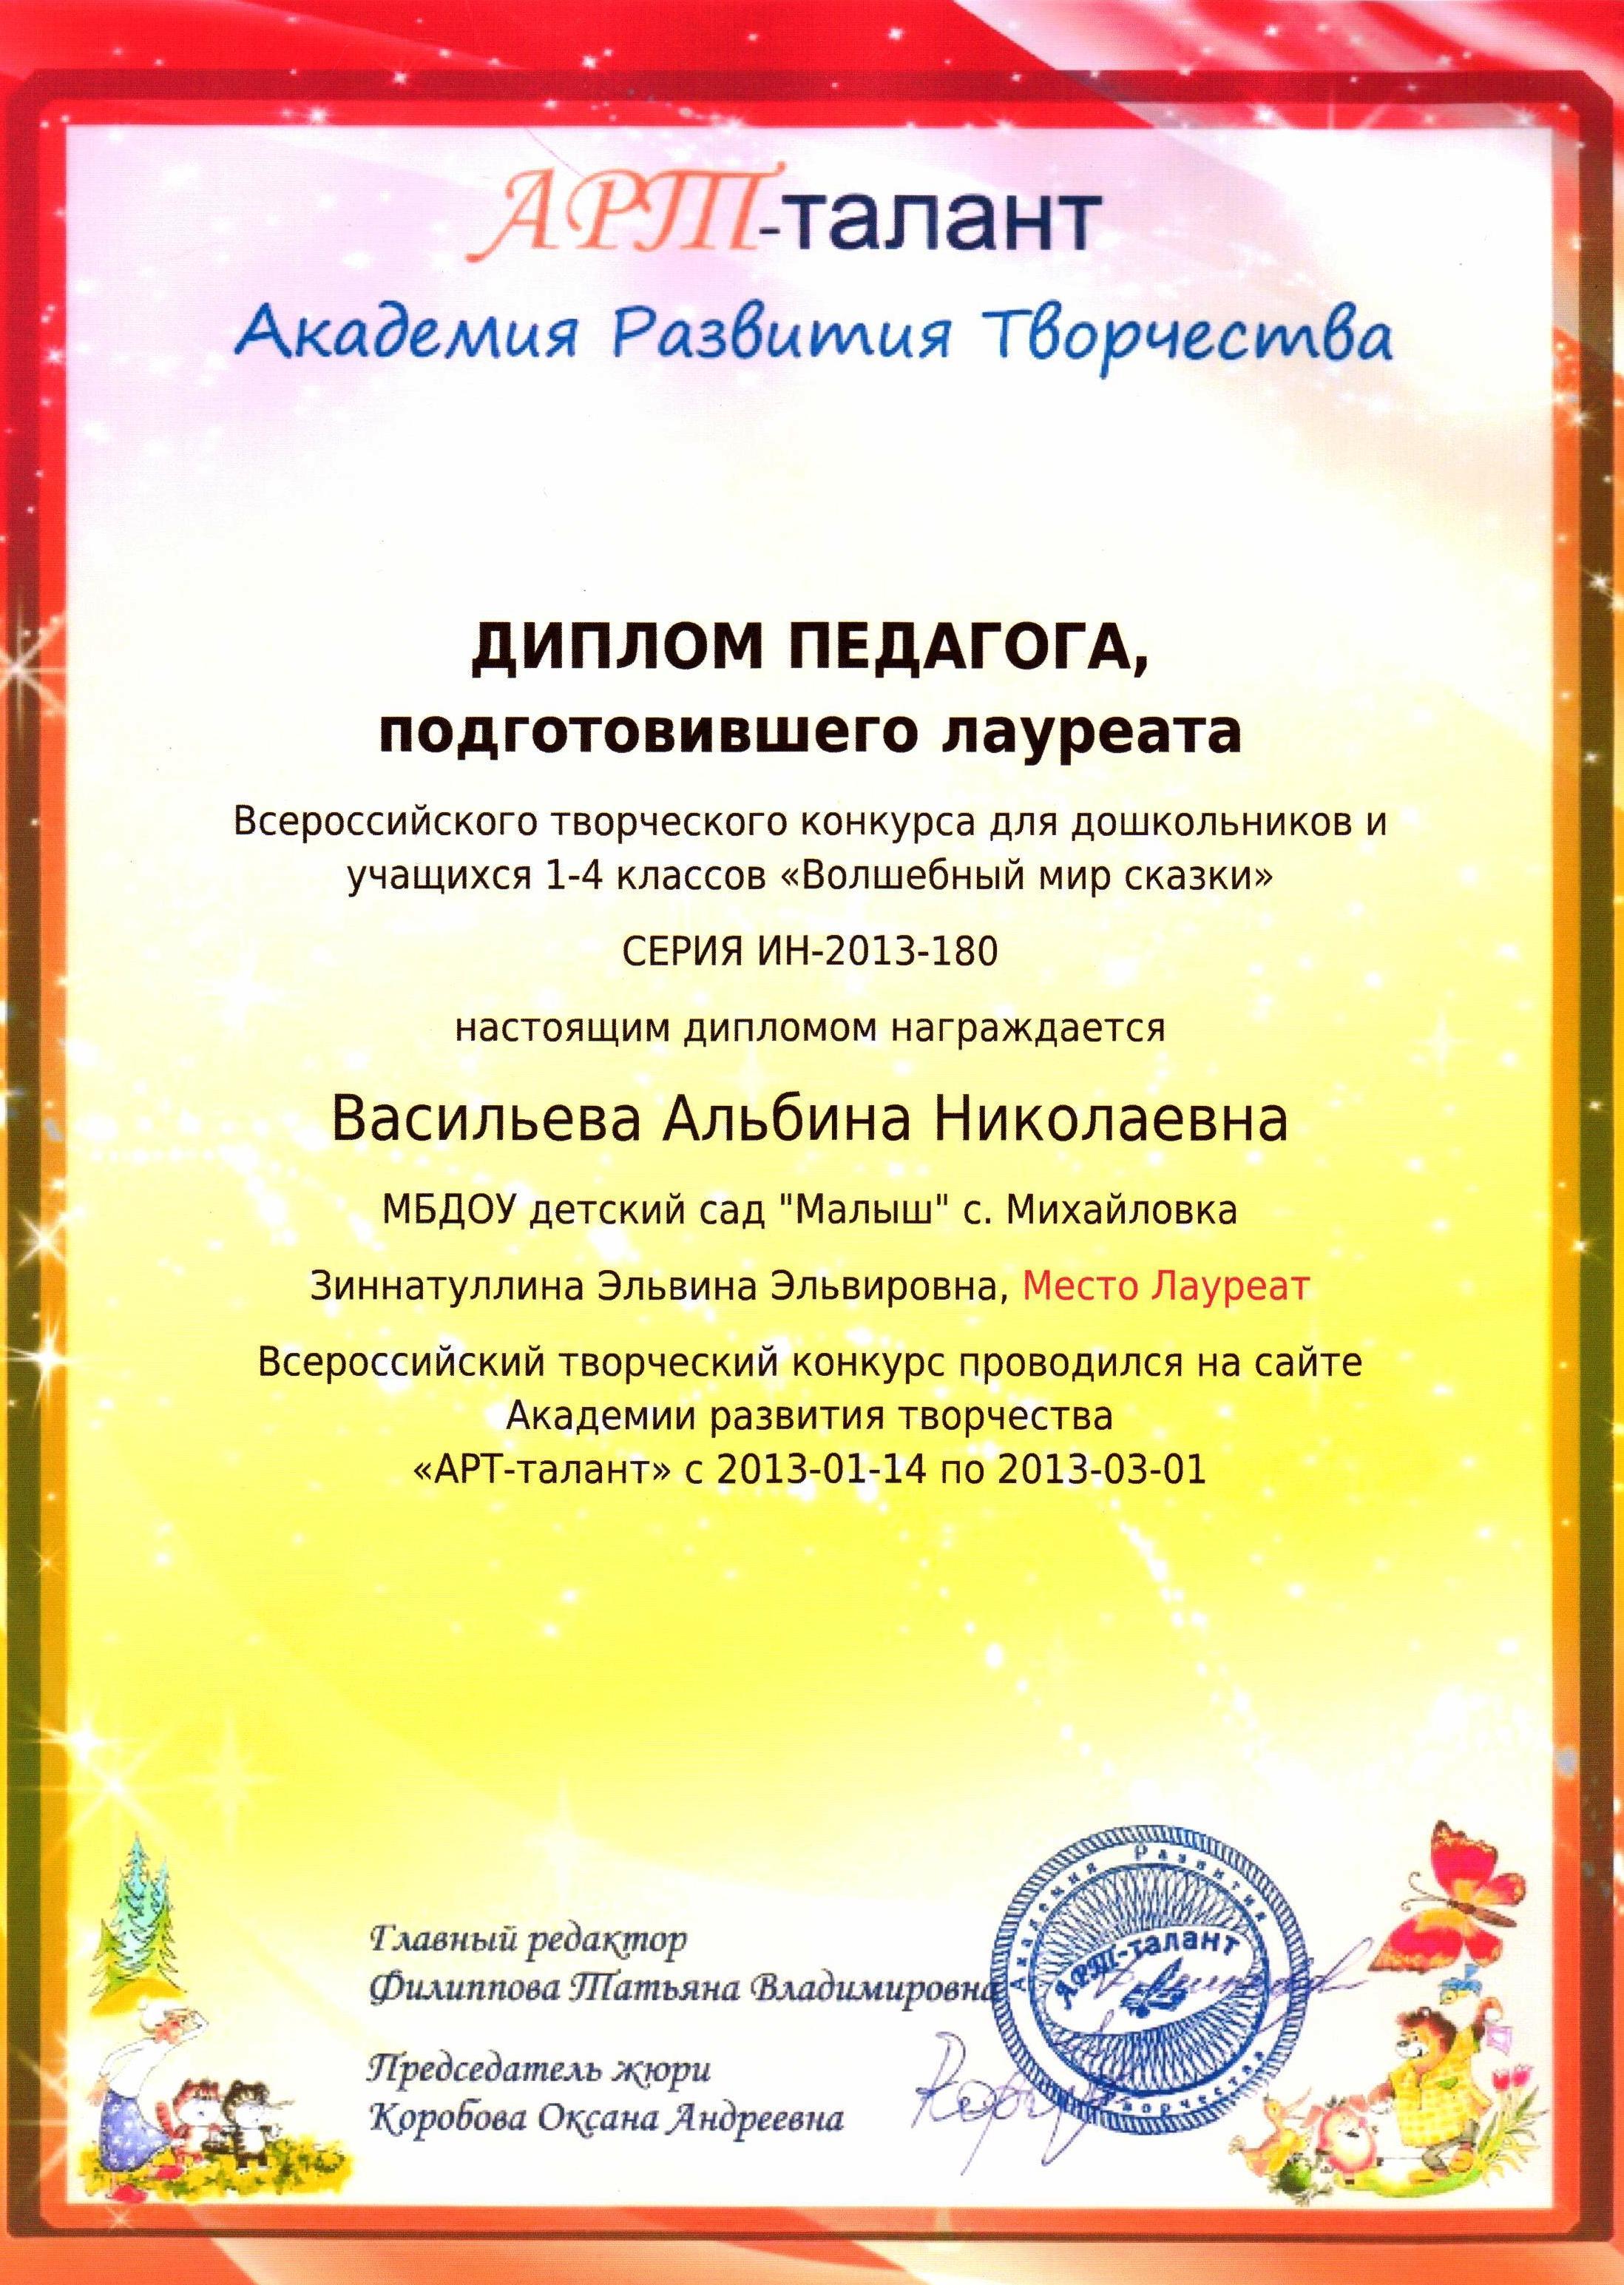 Конкурсы академия талантов